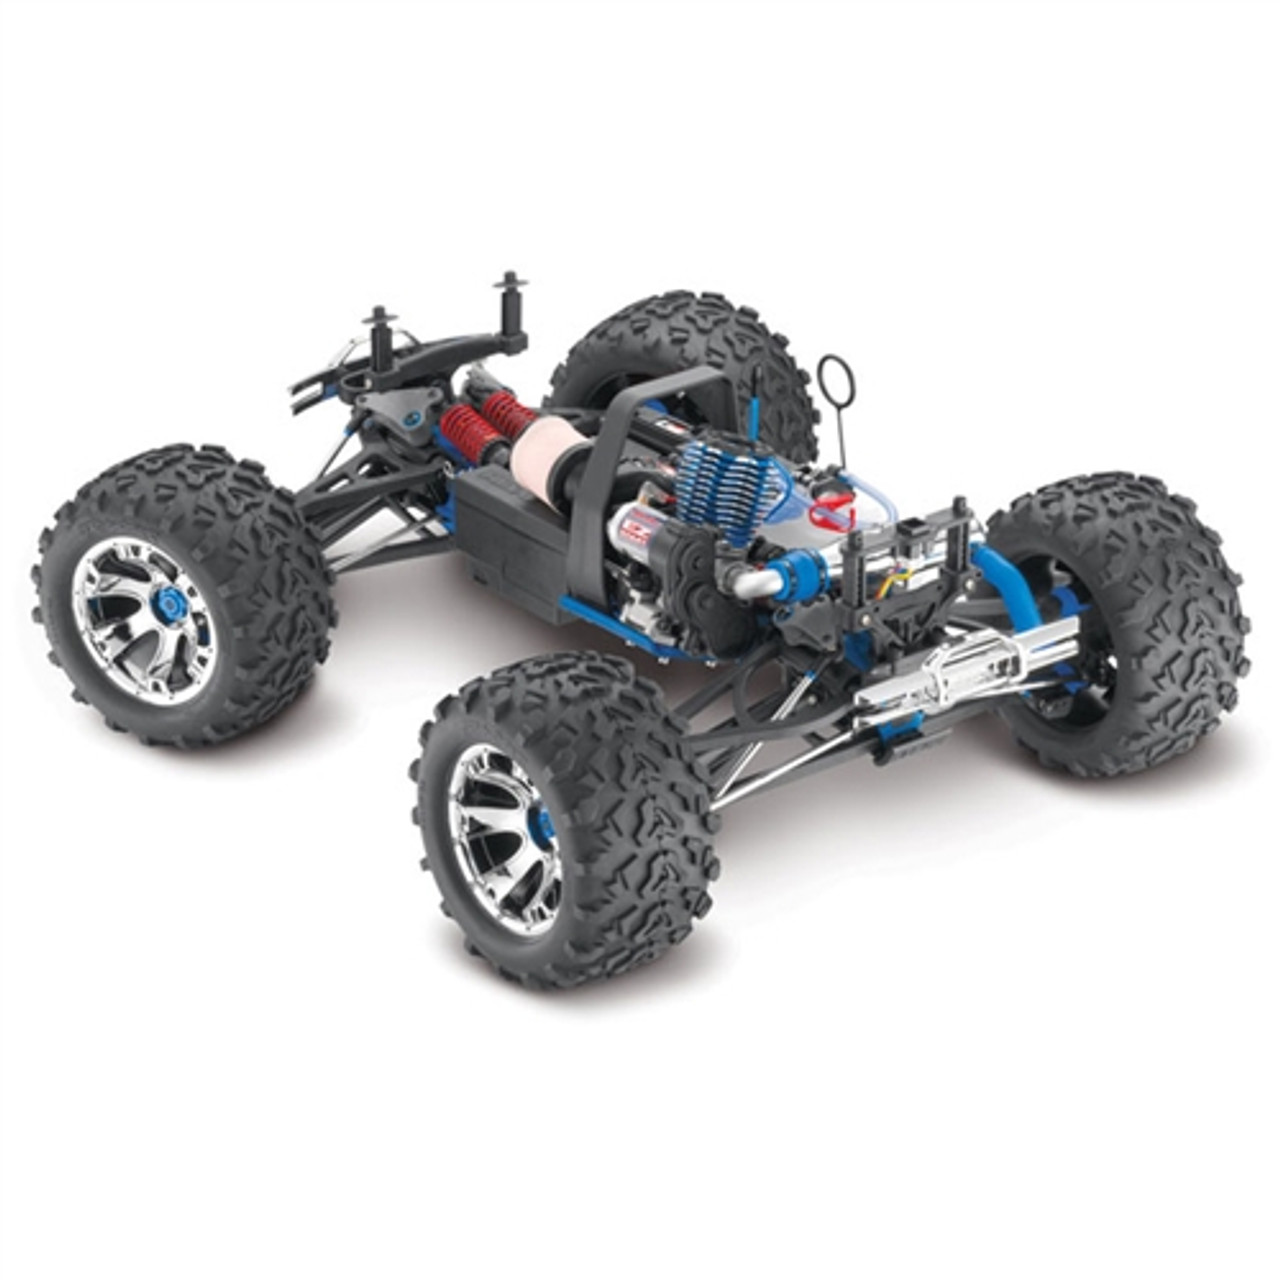 Traxxas Revo 3 3 Nitro 4wd Rc Monster Truck